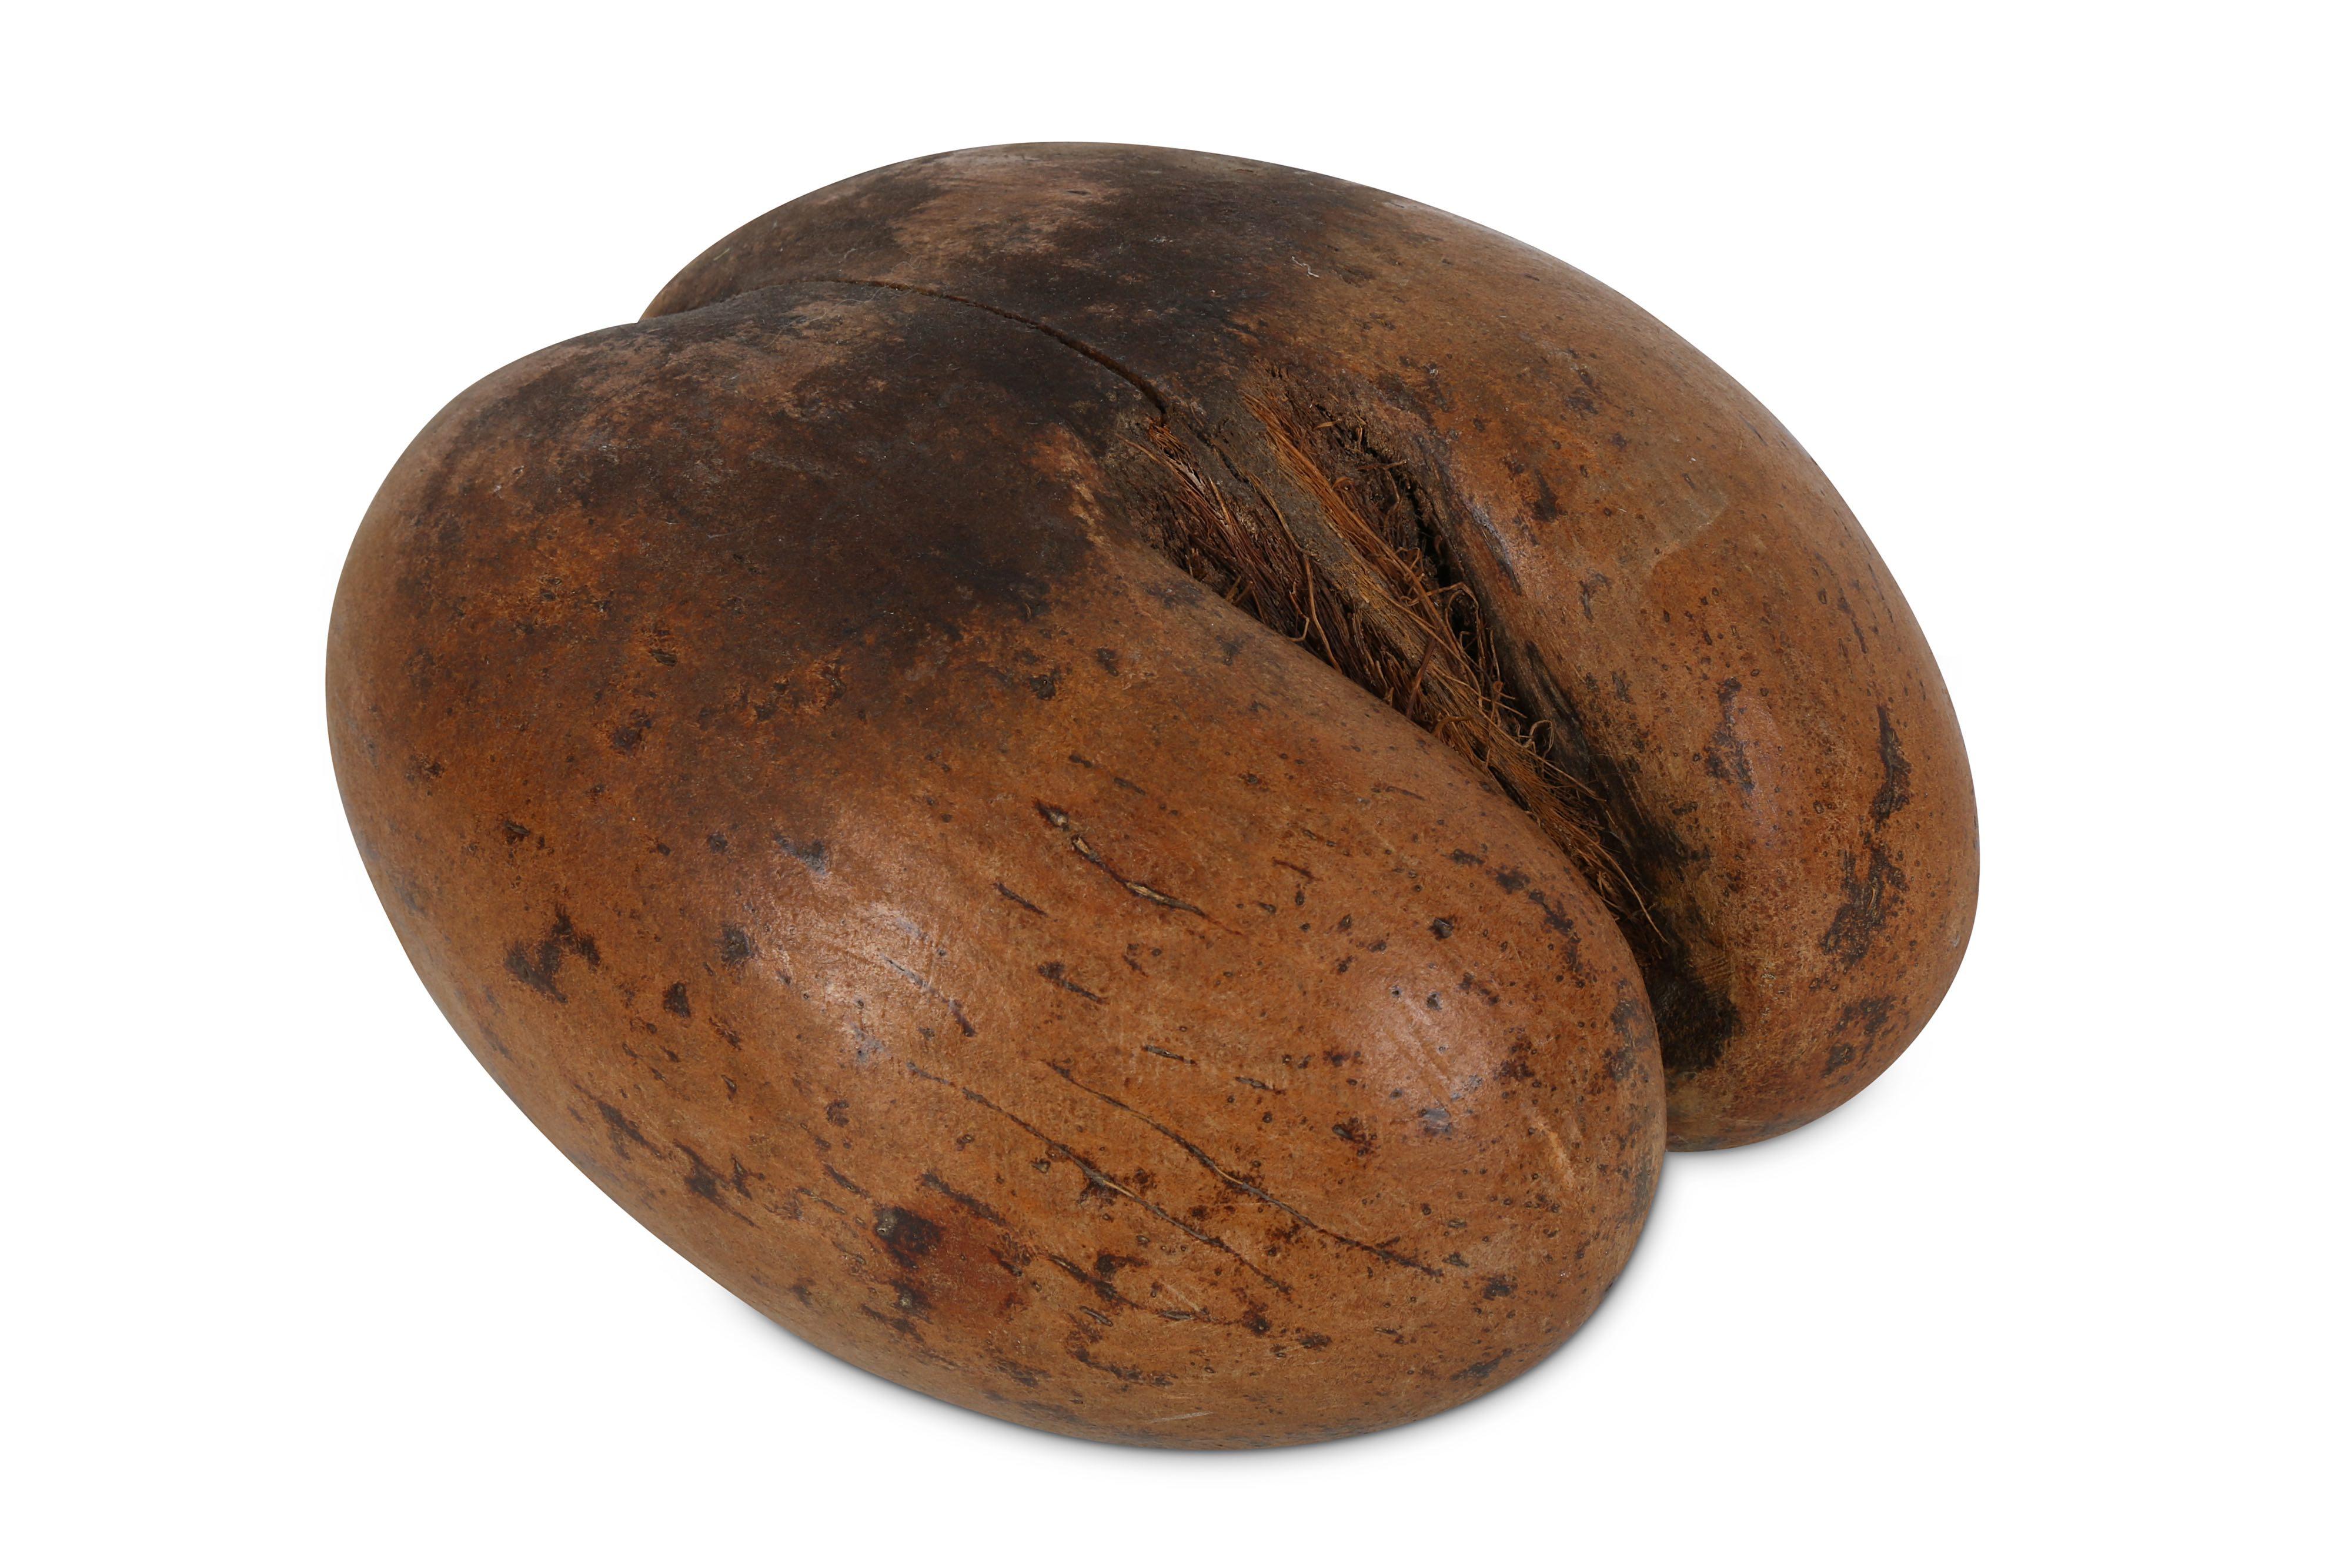 A POLISHED COCO DE MER NUT (LODOICEA MALDIVICA)